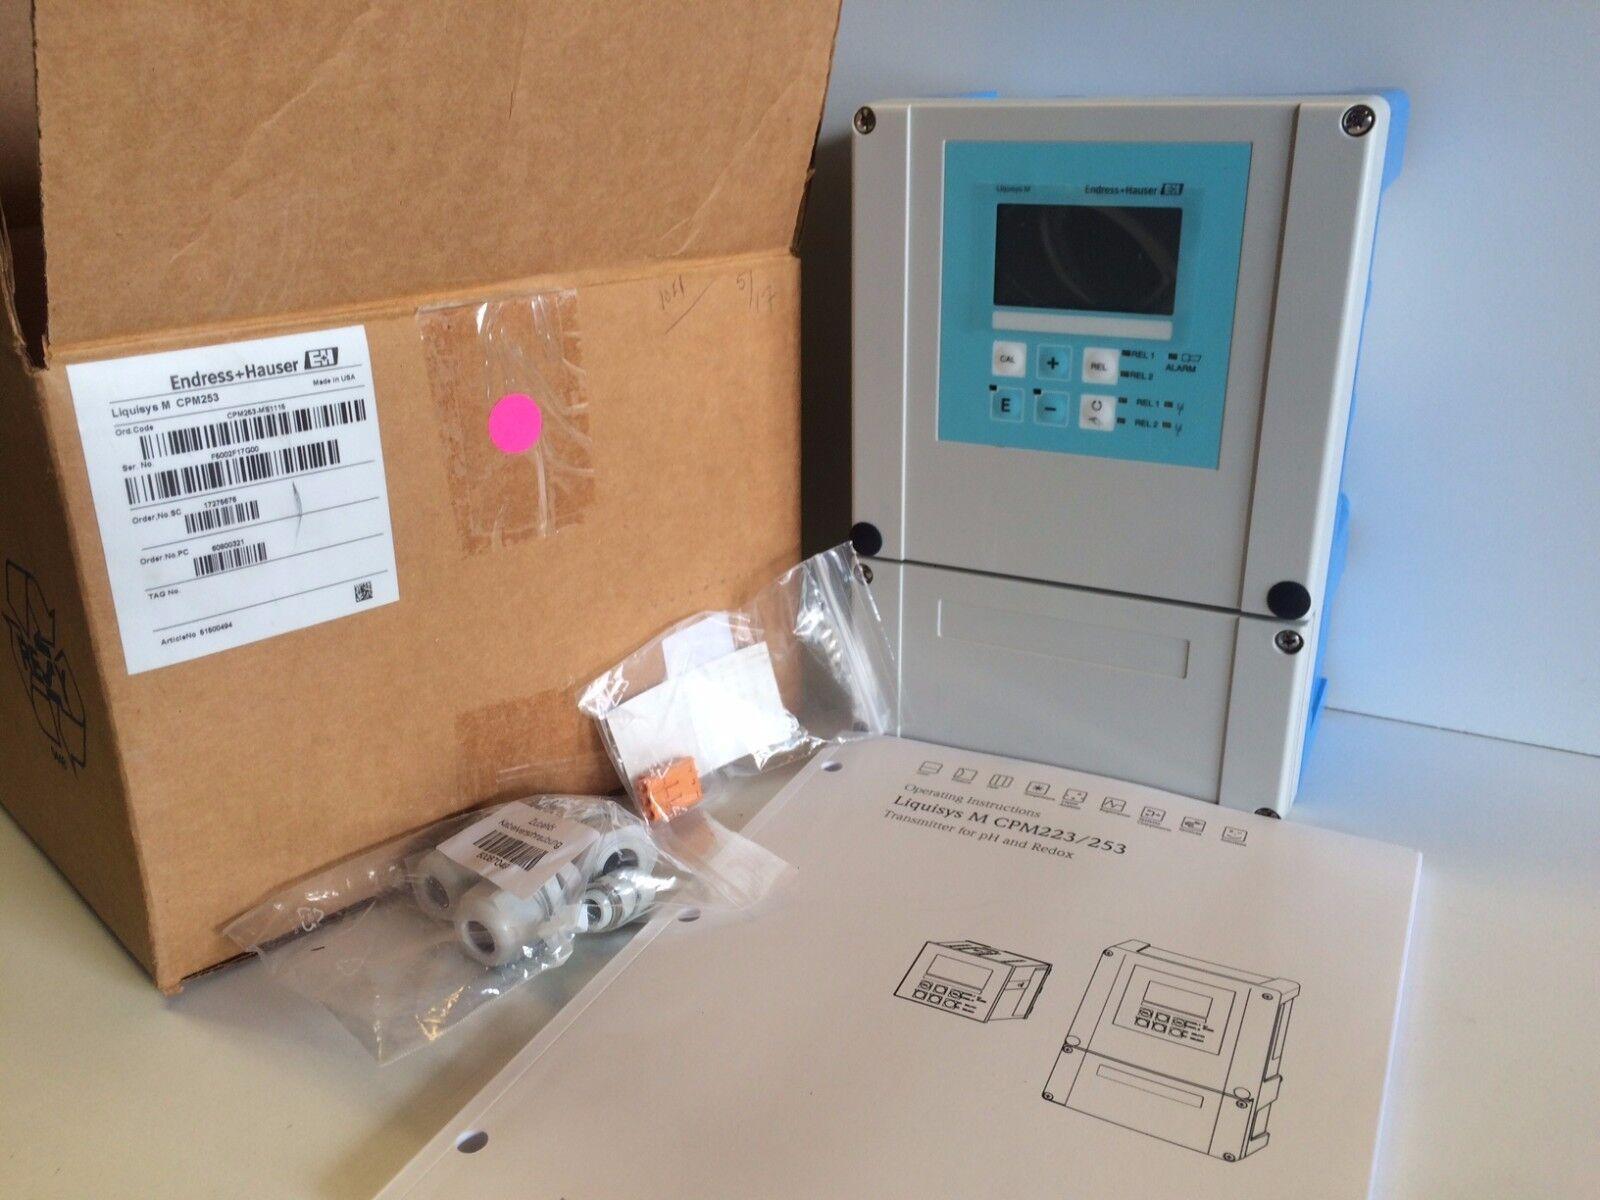 Endress Hauser Liquisys M Cpm253 Ms1115 Ph Controller System Ebay Arc Fault Circuit Breaker Qo120cafic Noninterchangable Norton Secured Powered By Verisign